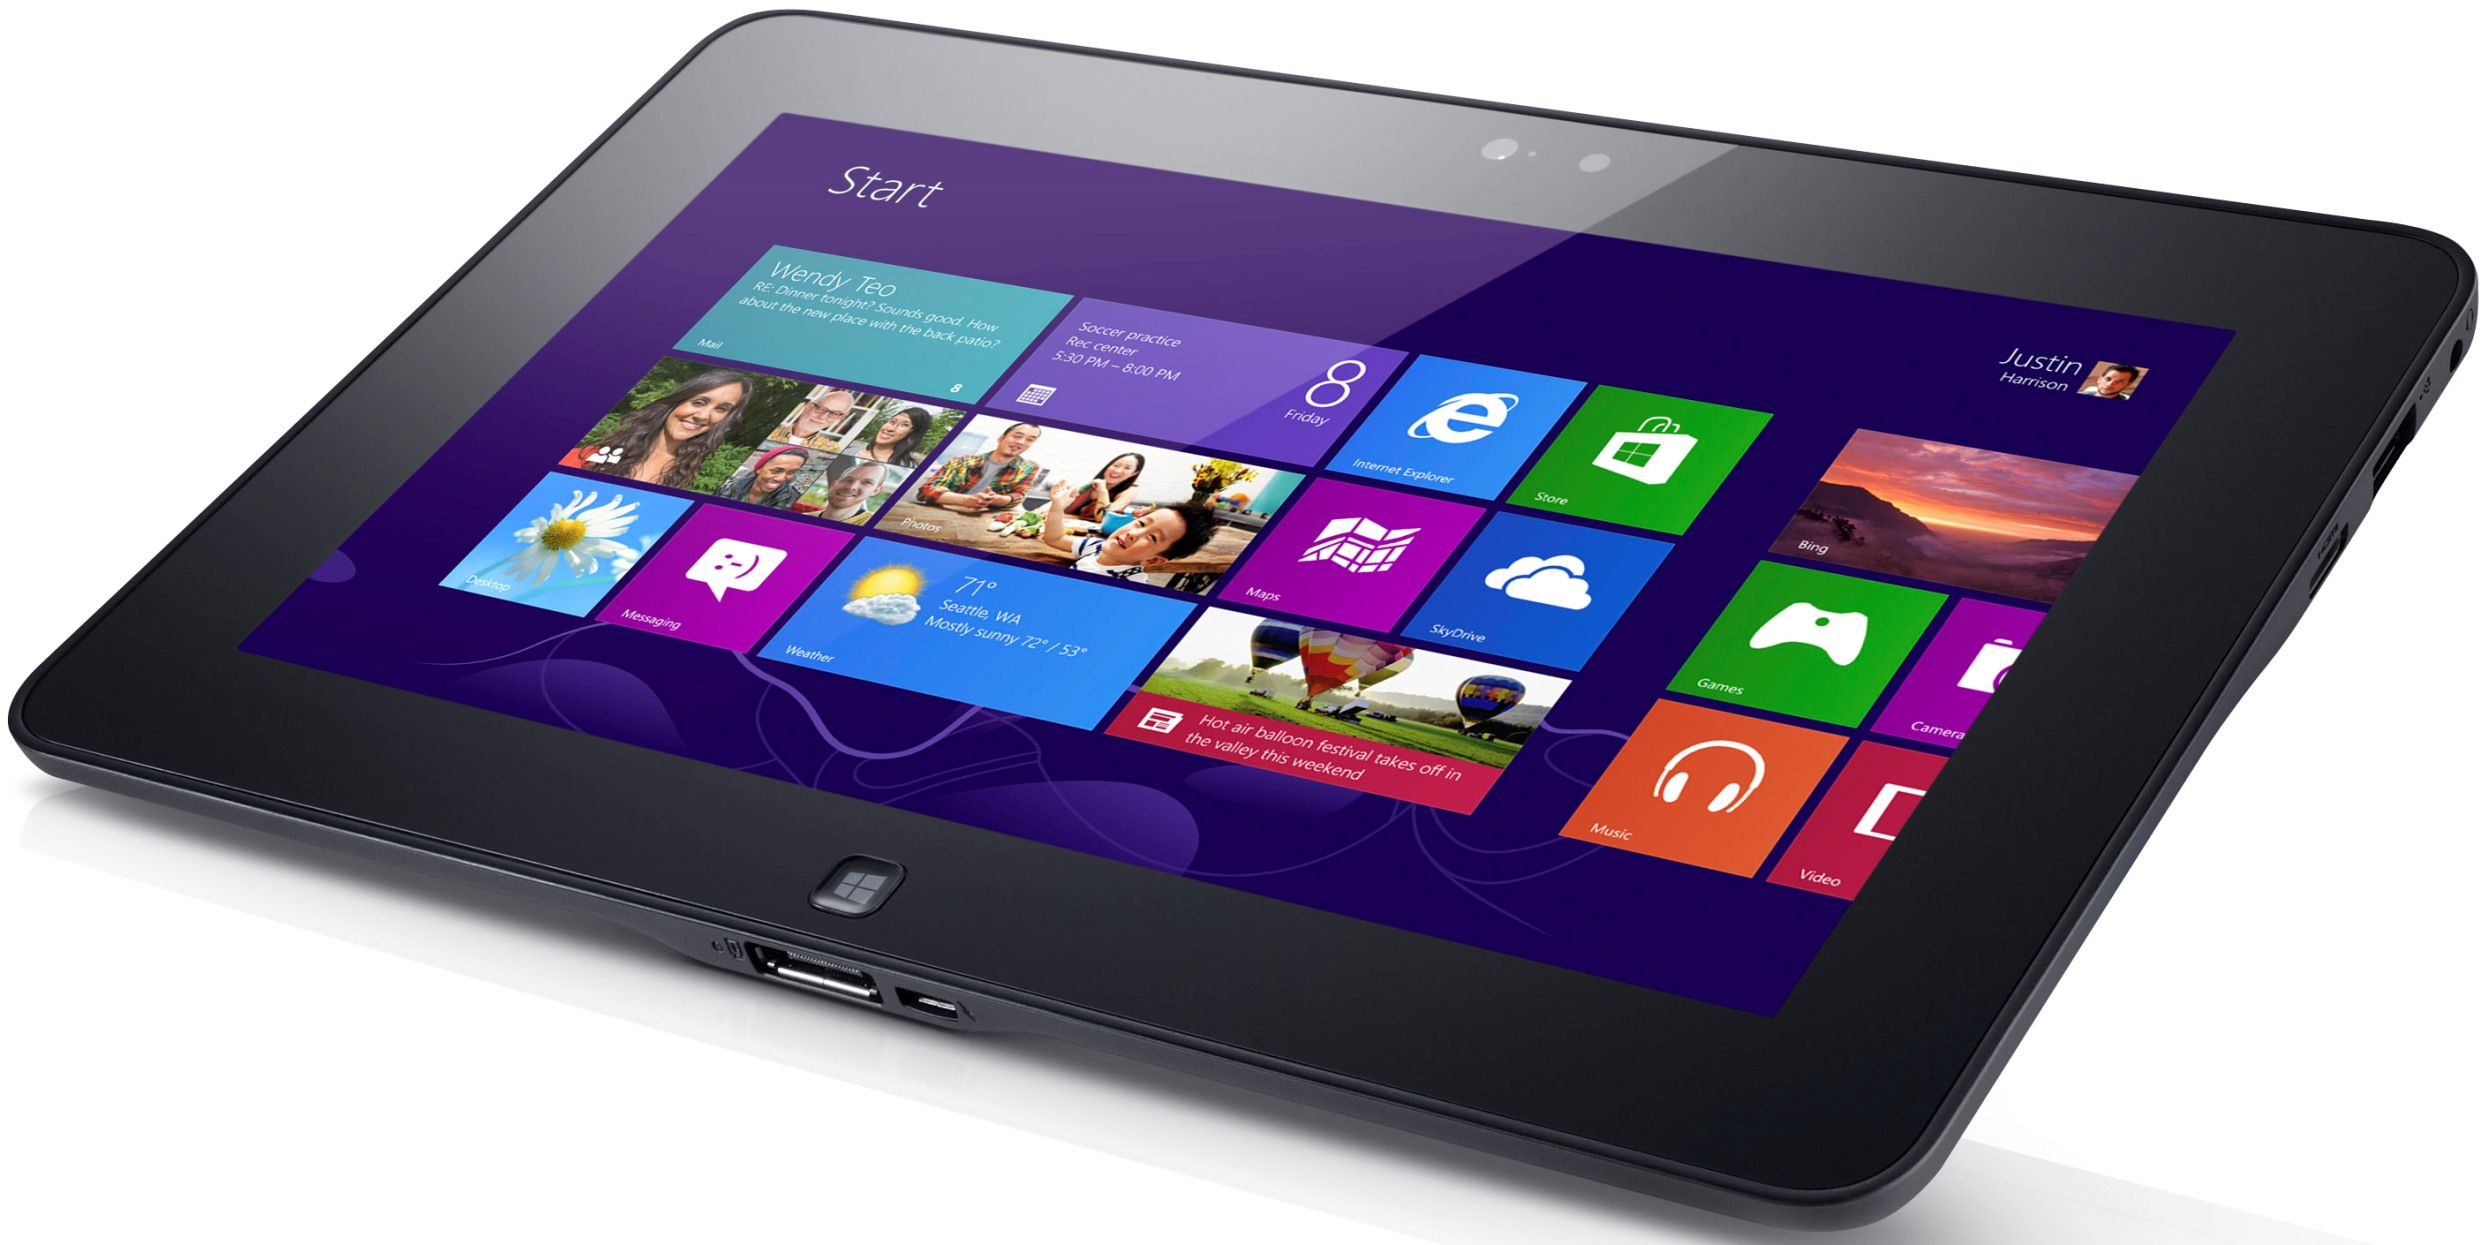 tablet wallpaper Hd windows 8 tablet wallpaper Desktop 2489x1245